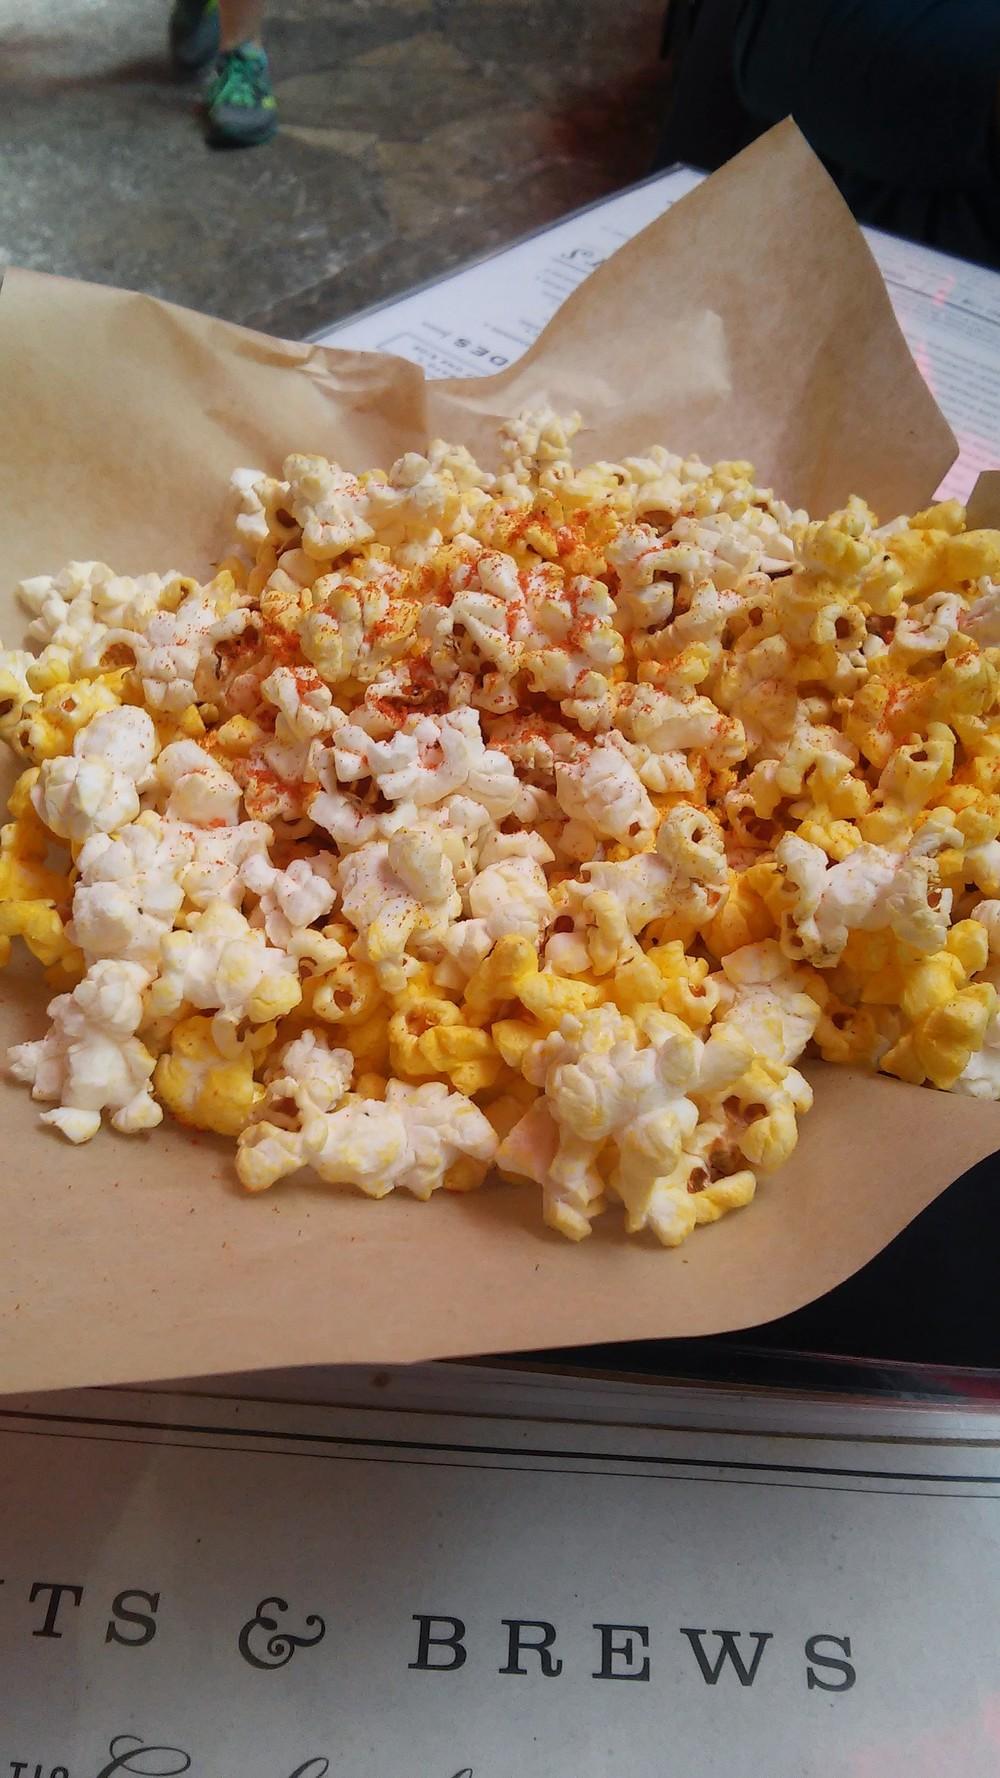 House popcorn